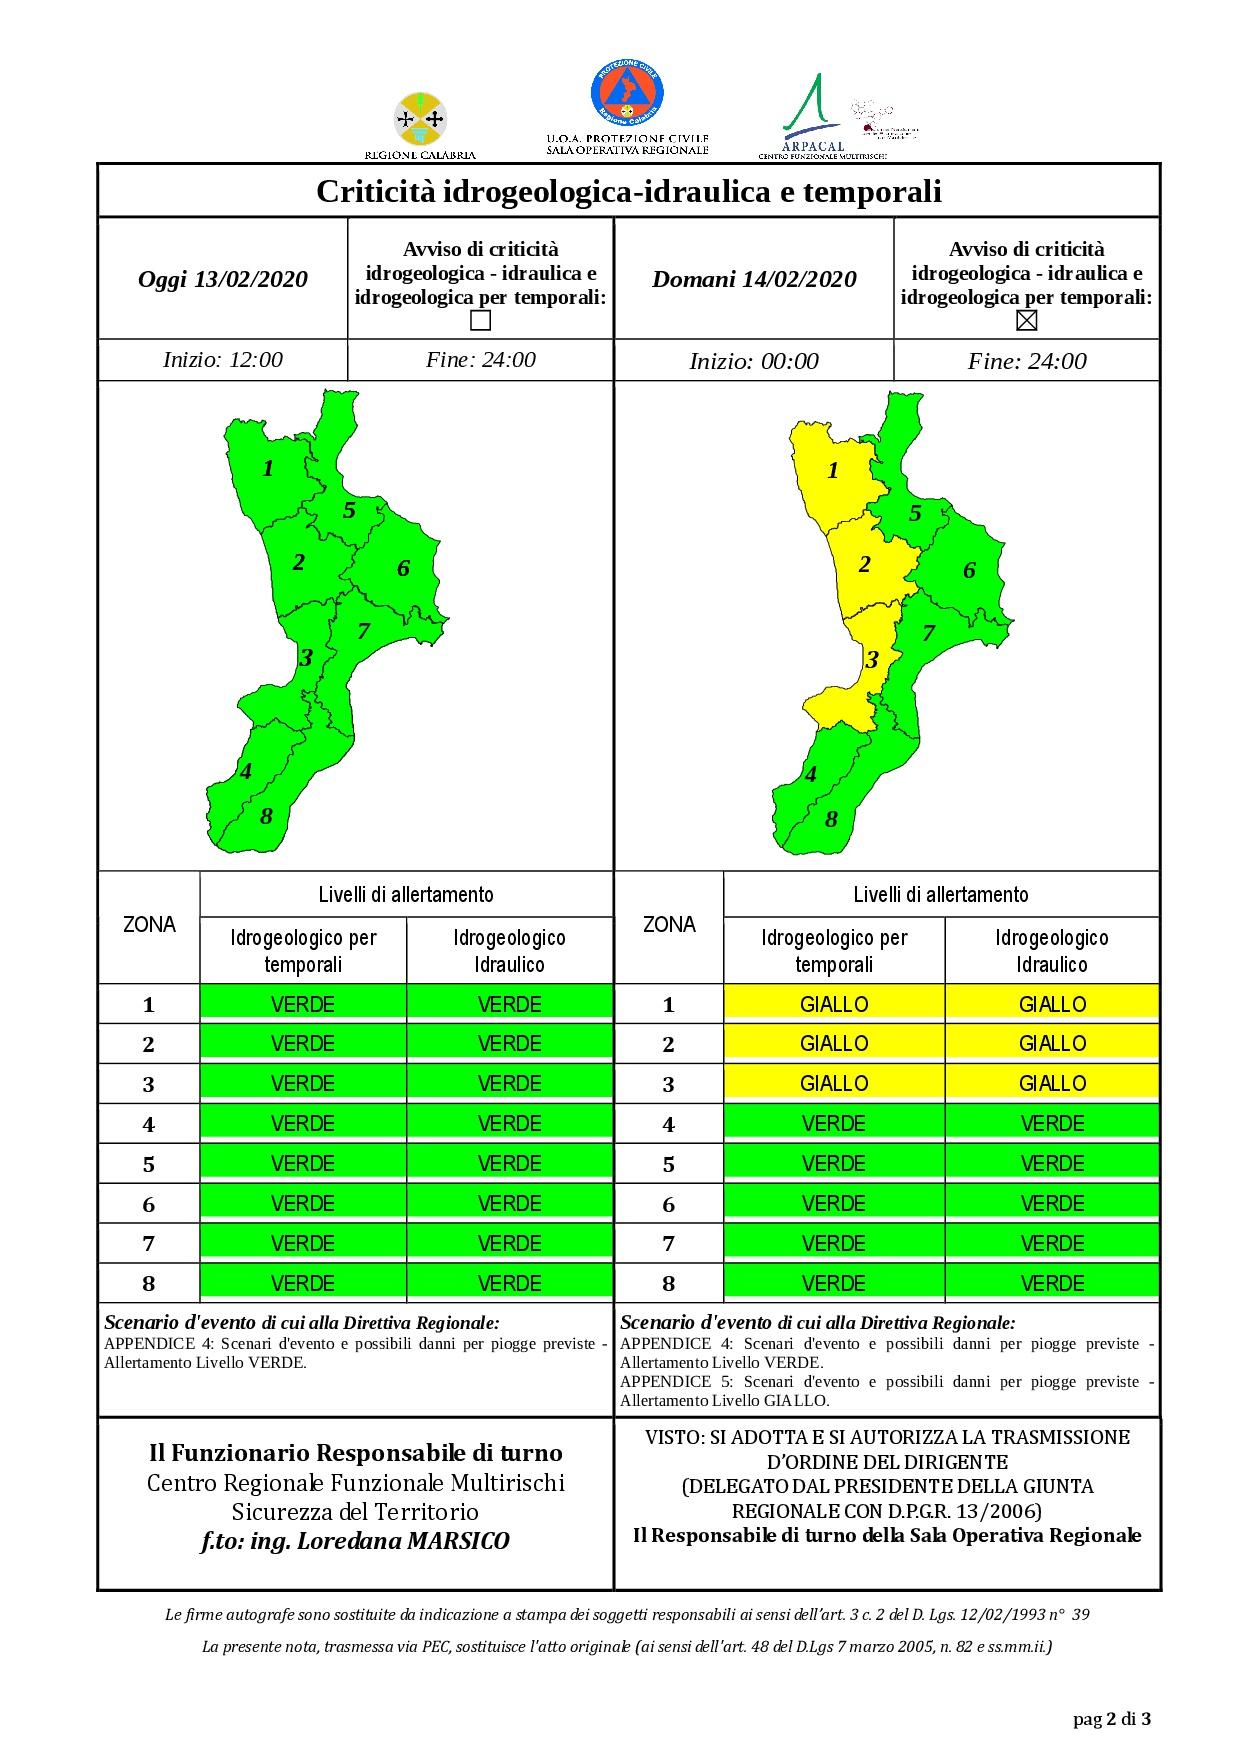 Criticità idrogeologica-idraulica e temporali in Calabria 13-02-2020